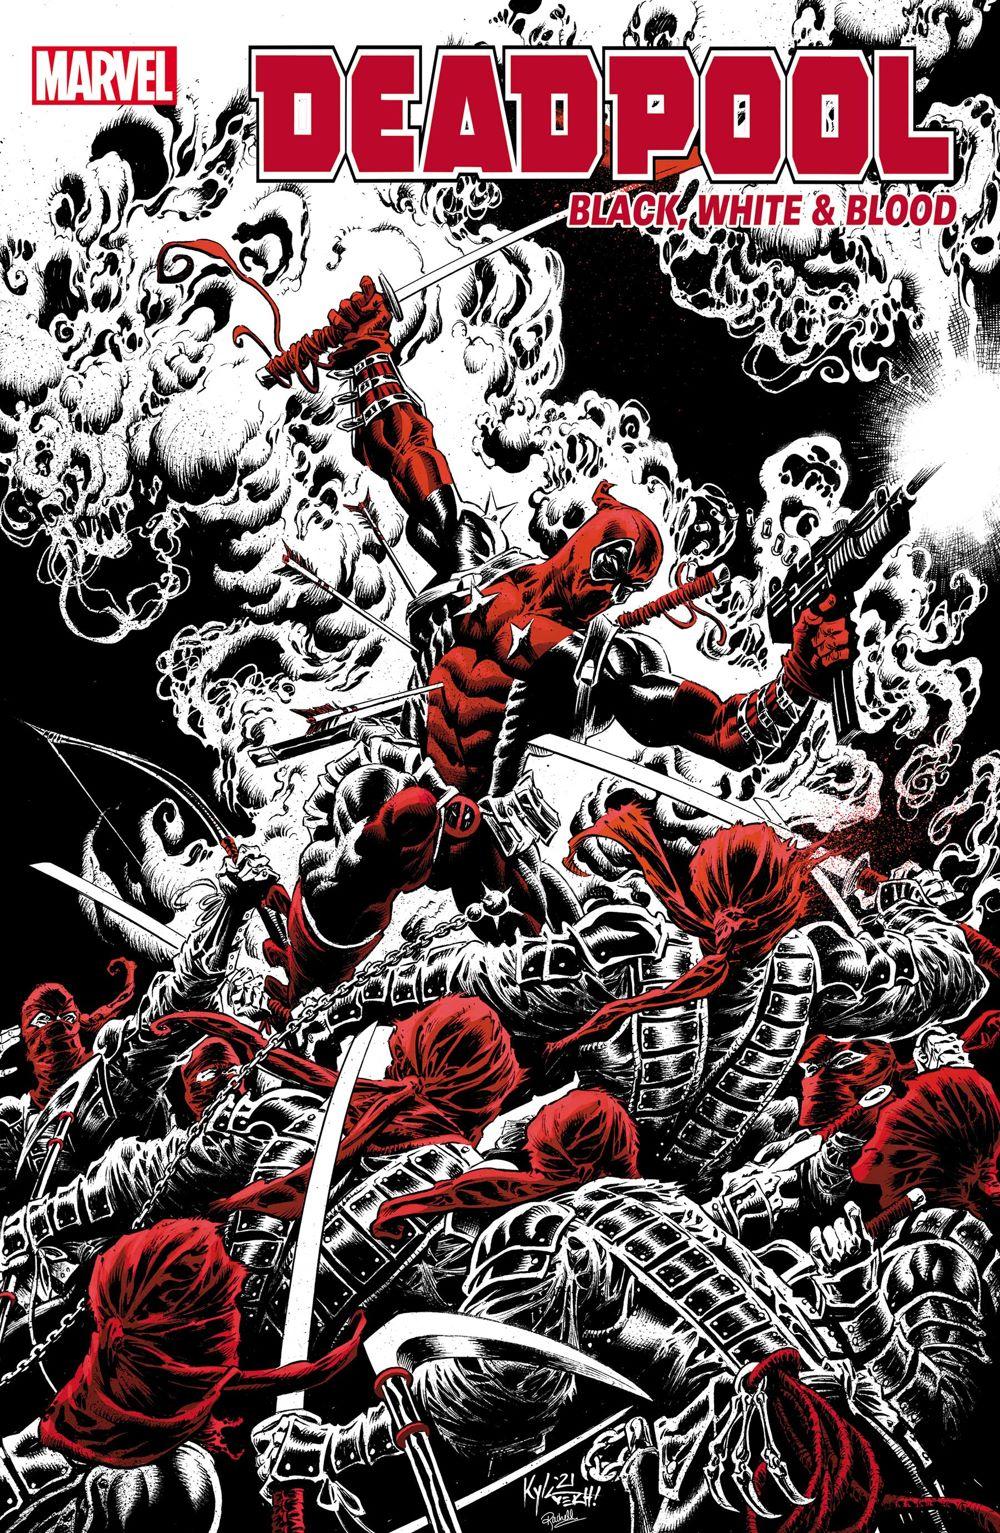 DPOOLBLKWHBL2021001_Hotz_Var Marvel Comics August 2021 Solicitations